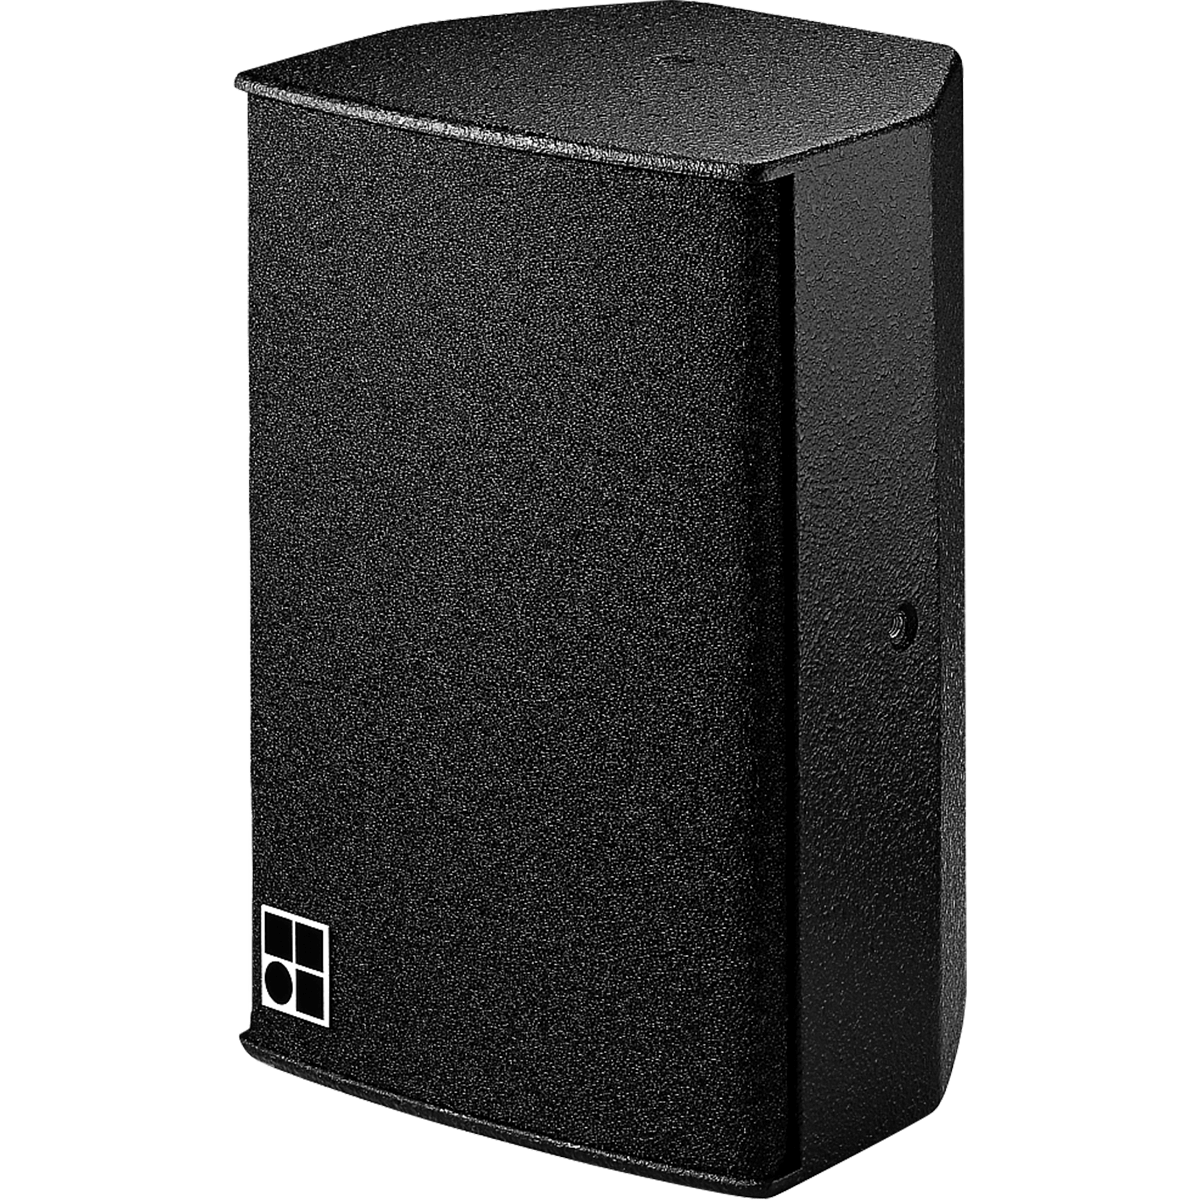 ci80 lautsprecher d b audiotechnik. Black Bedroom Furniture Sets. Home Design Ideas